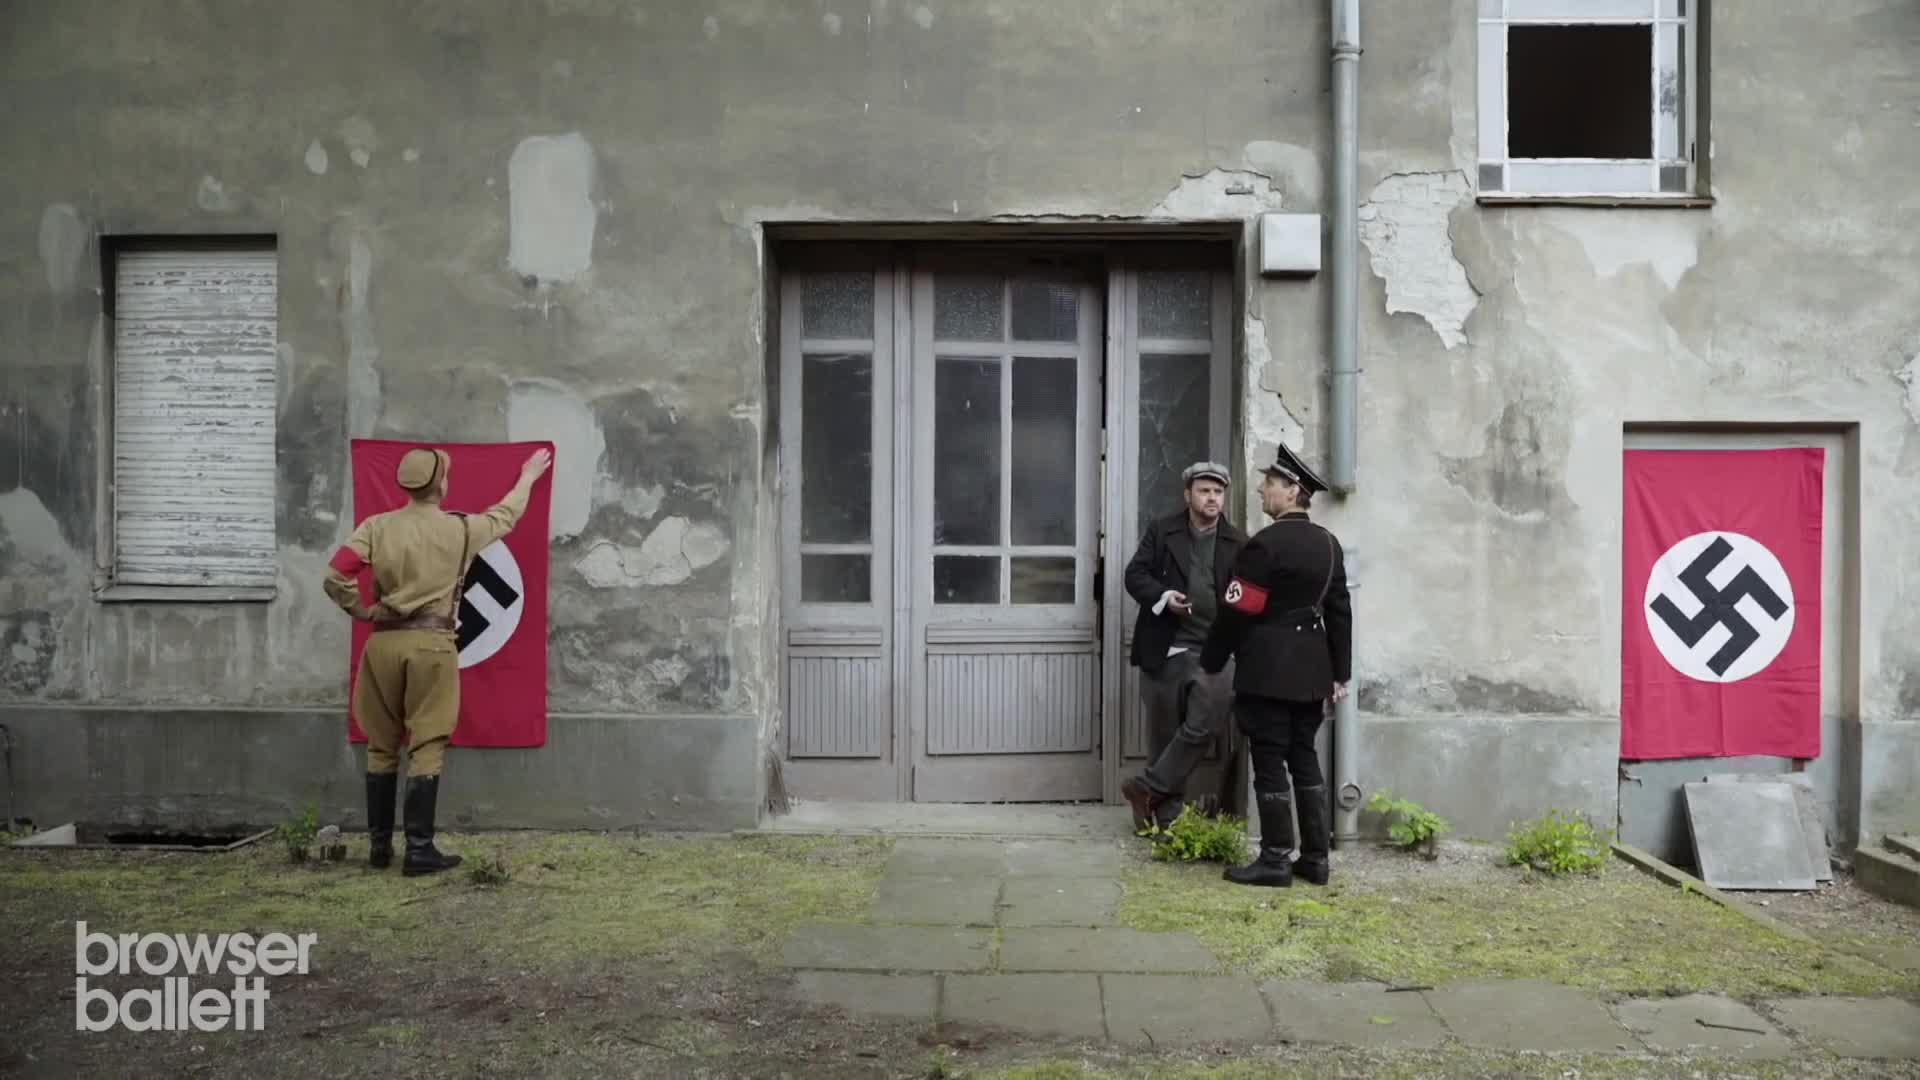 bohemian browser ballett, christian brandes, comedy, cool, german, interesting, nazis, satire, Nazikeule im Dritten Reich (Short) GIFs